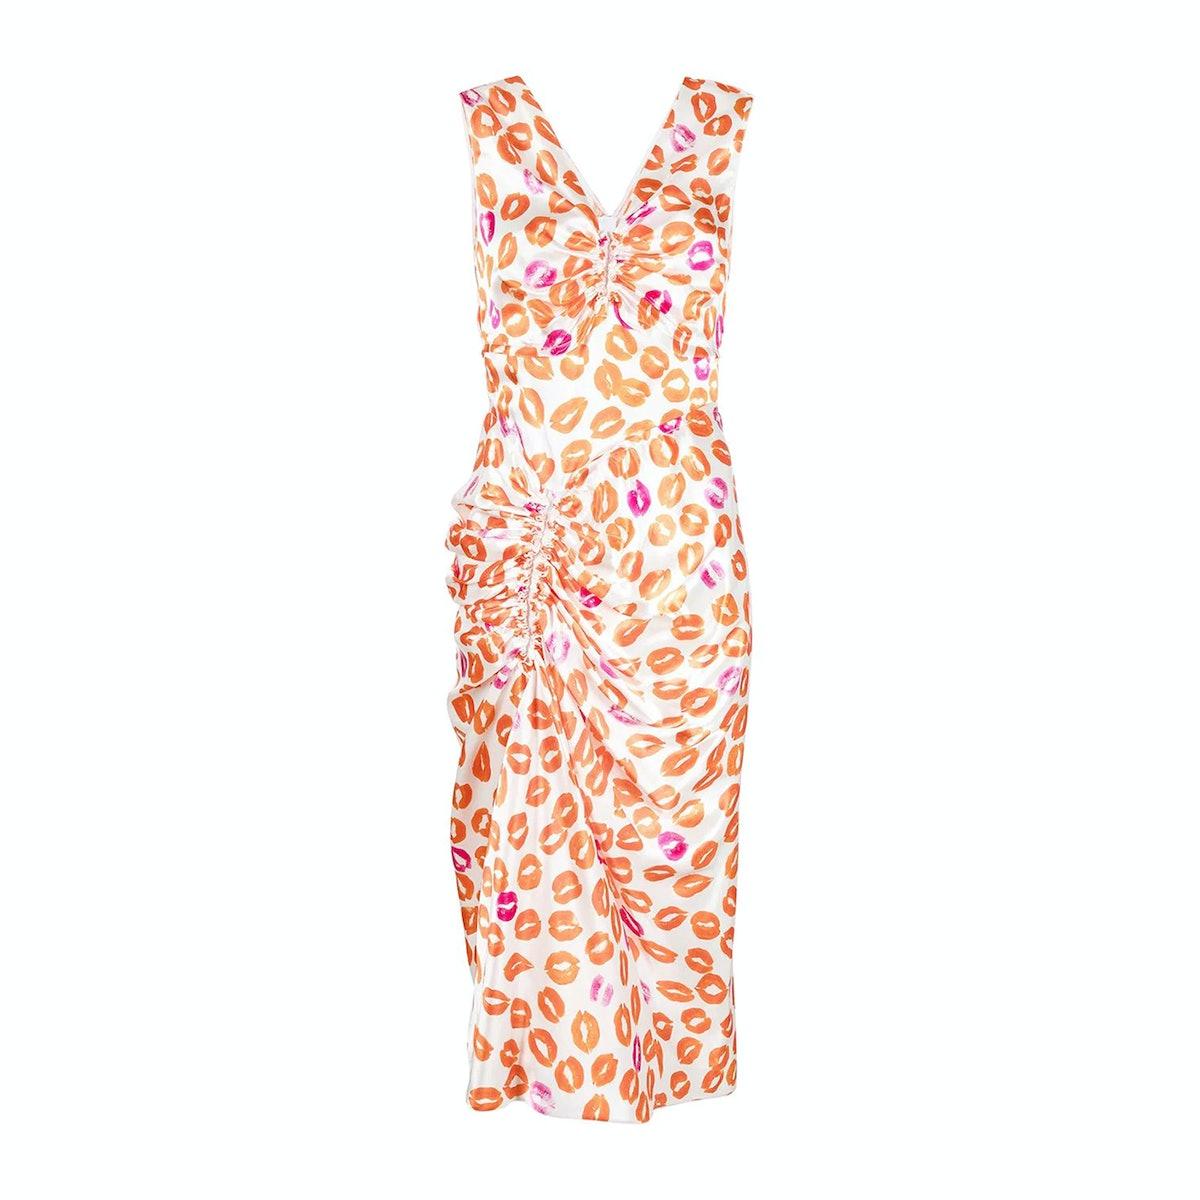 Marni Kiss Tornado Printed Dress